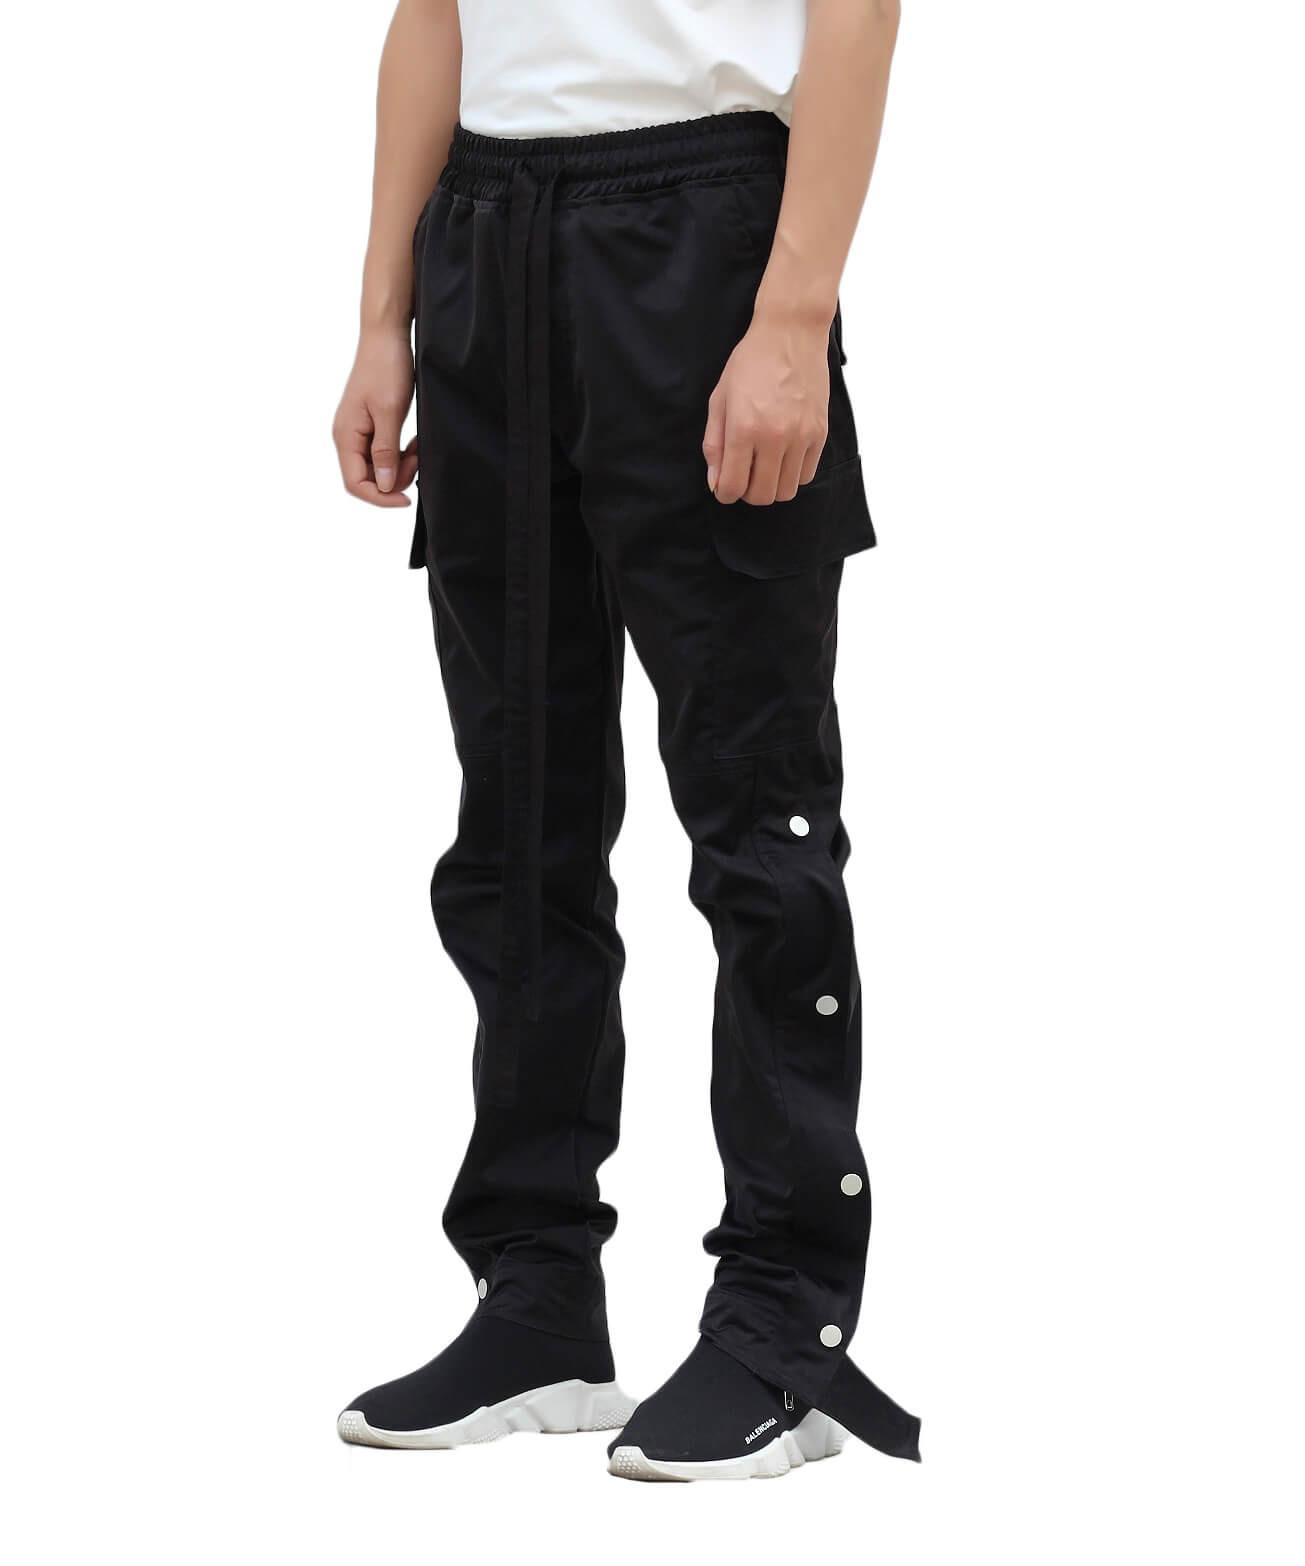 Nylon Snap Cargo Pants Black Urkoolwear